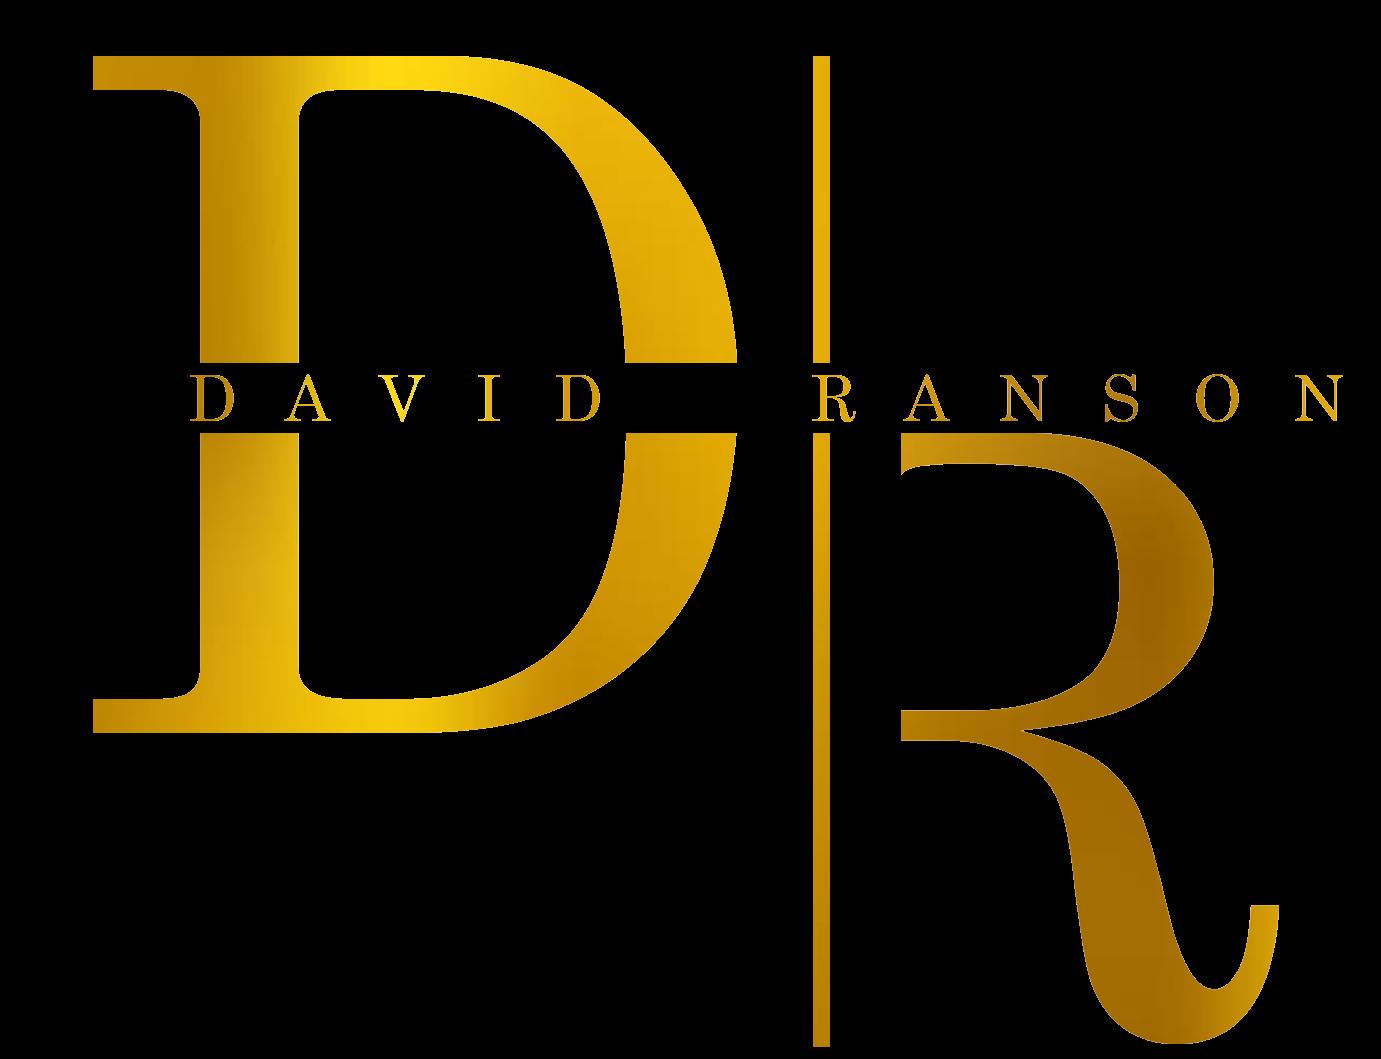 David Ranson